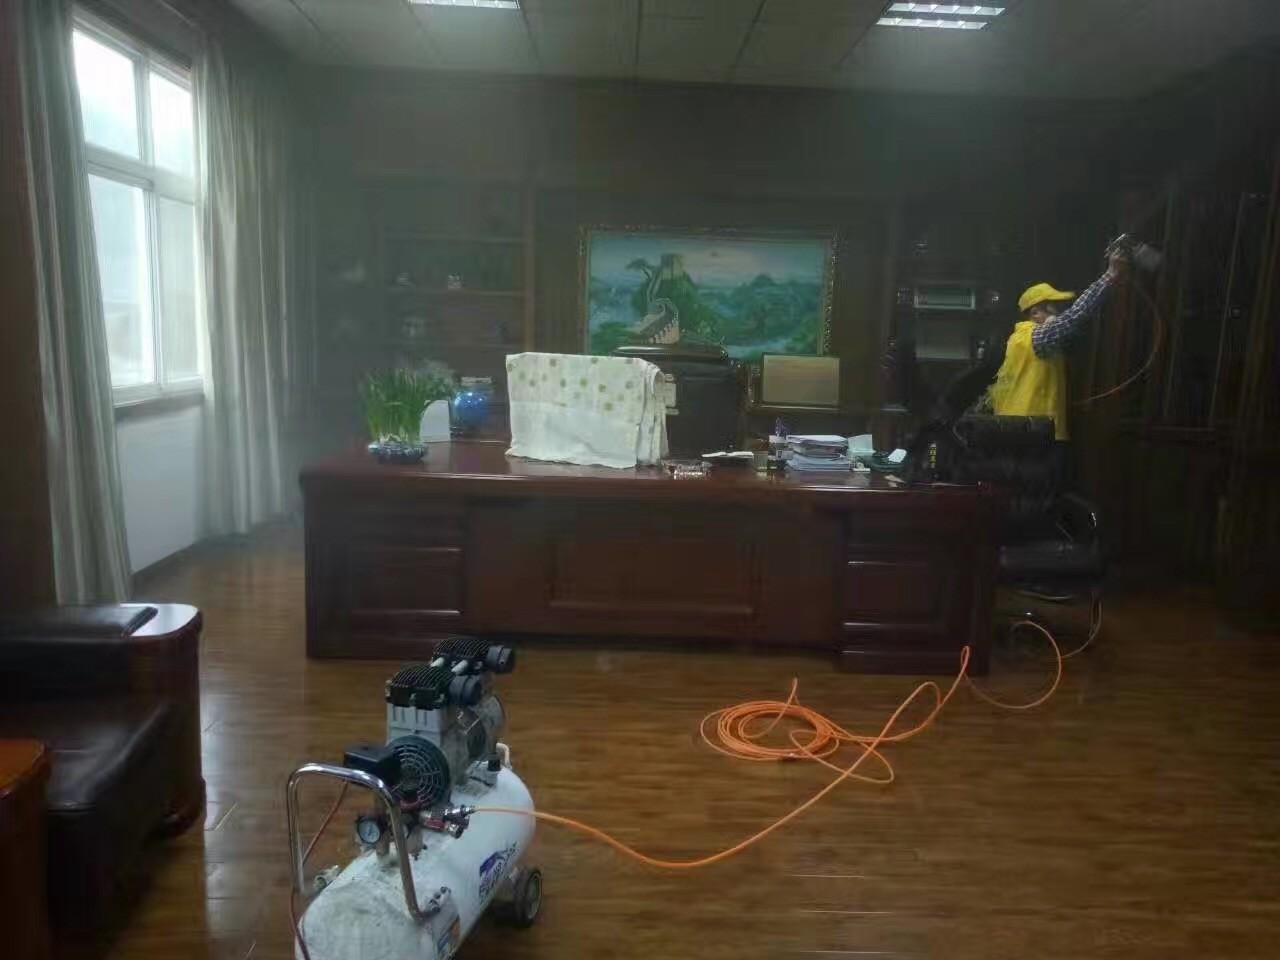 raybet官网雷竞技raybet官网——raybet官网黄泽物流